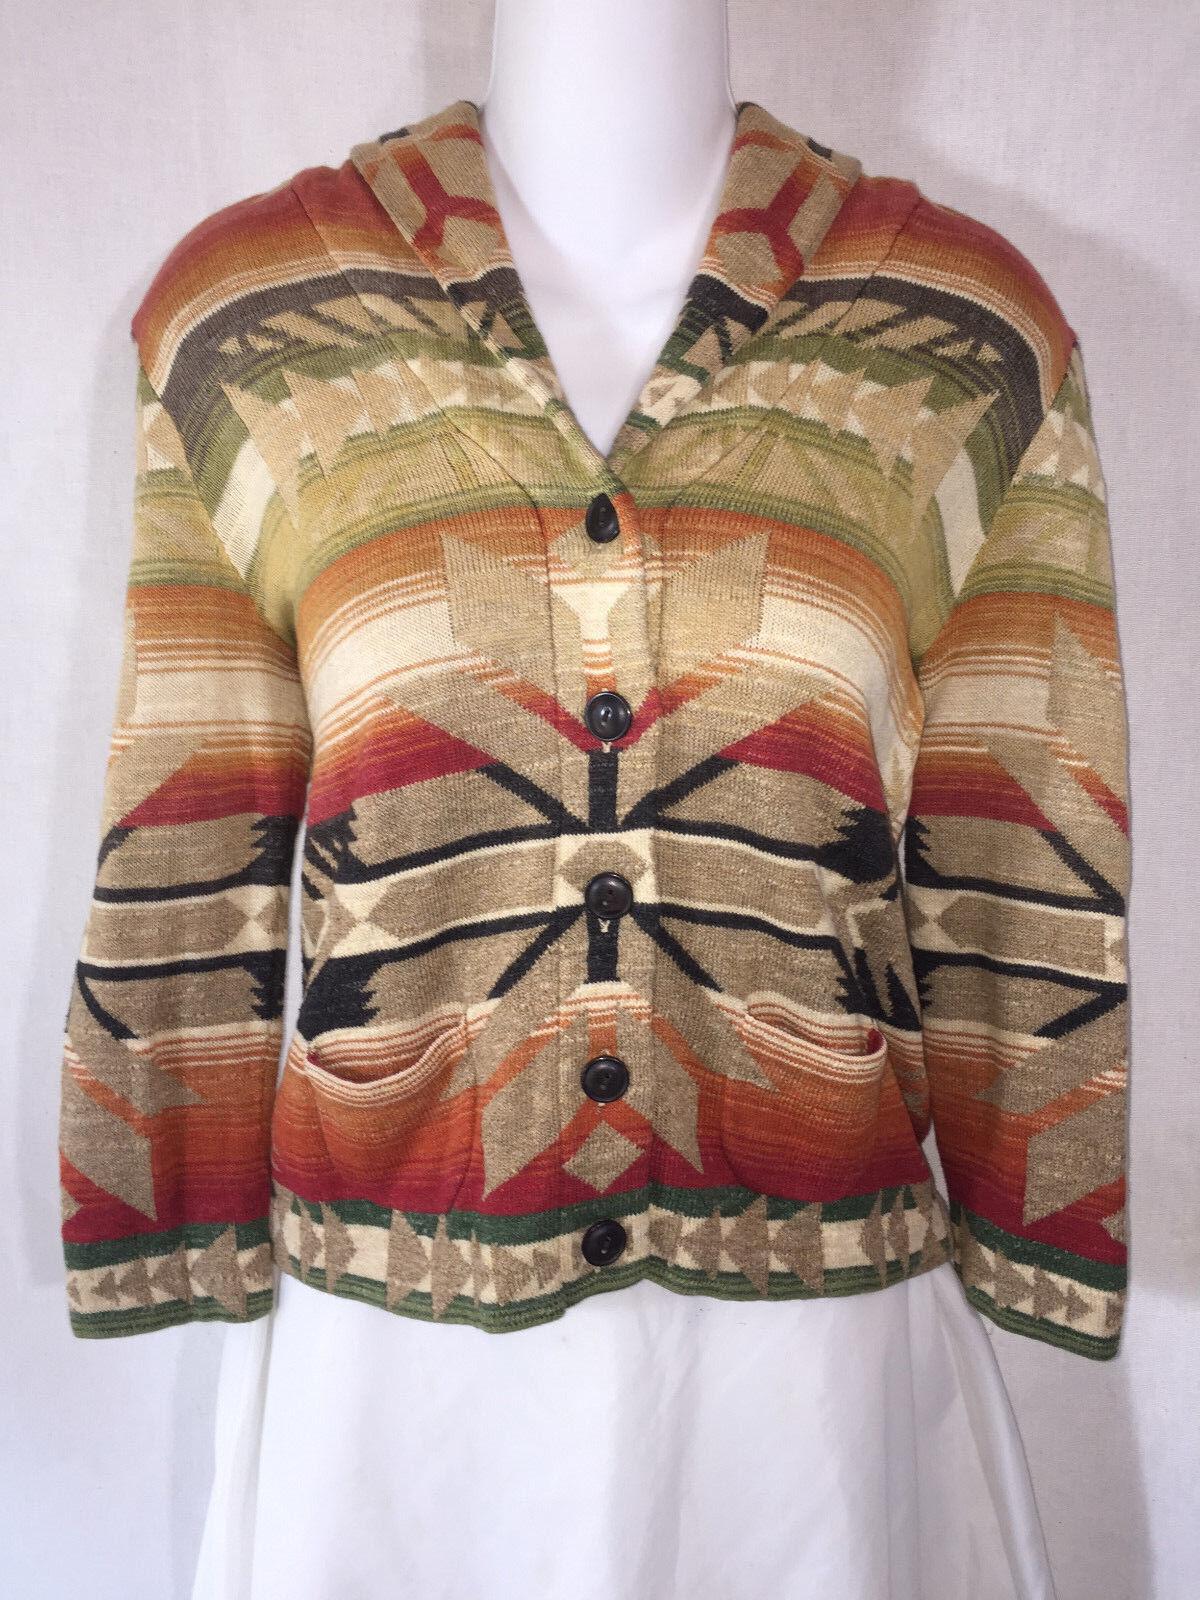 RALPH LAUREN DENIM & & & SUPPLY Aztec Indian Southwestern Knit Cardigan SWEATER PS S 98711b